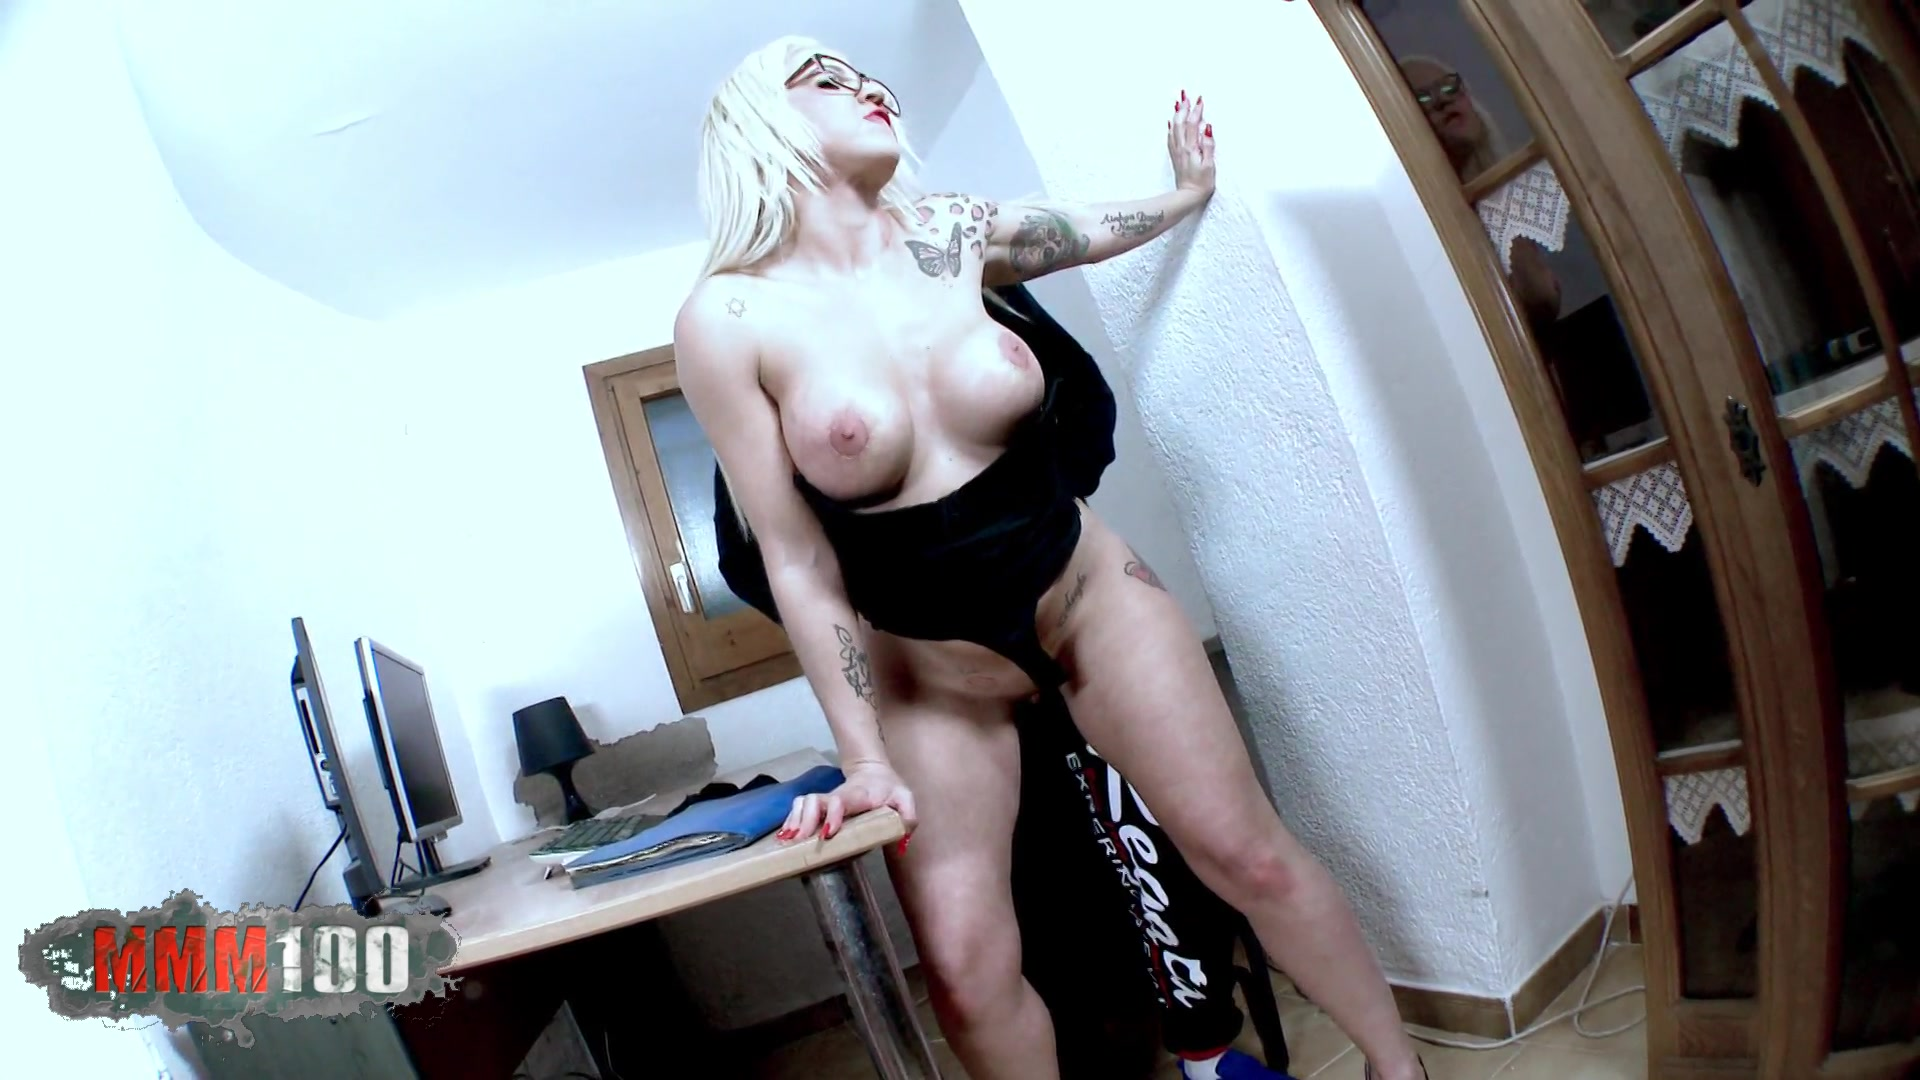 Ayesa Secretaria Debota Porno devoted secretary | mmm100